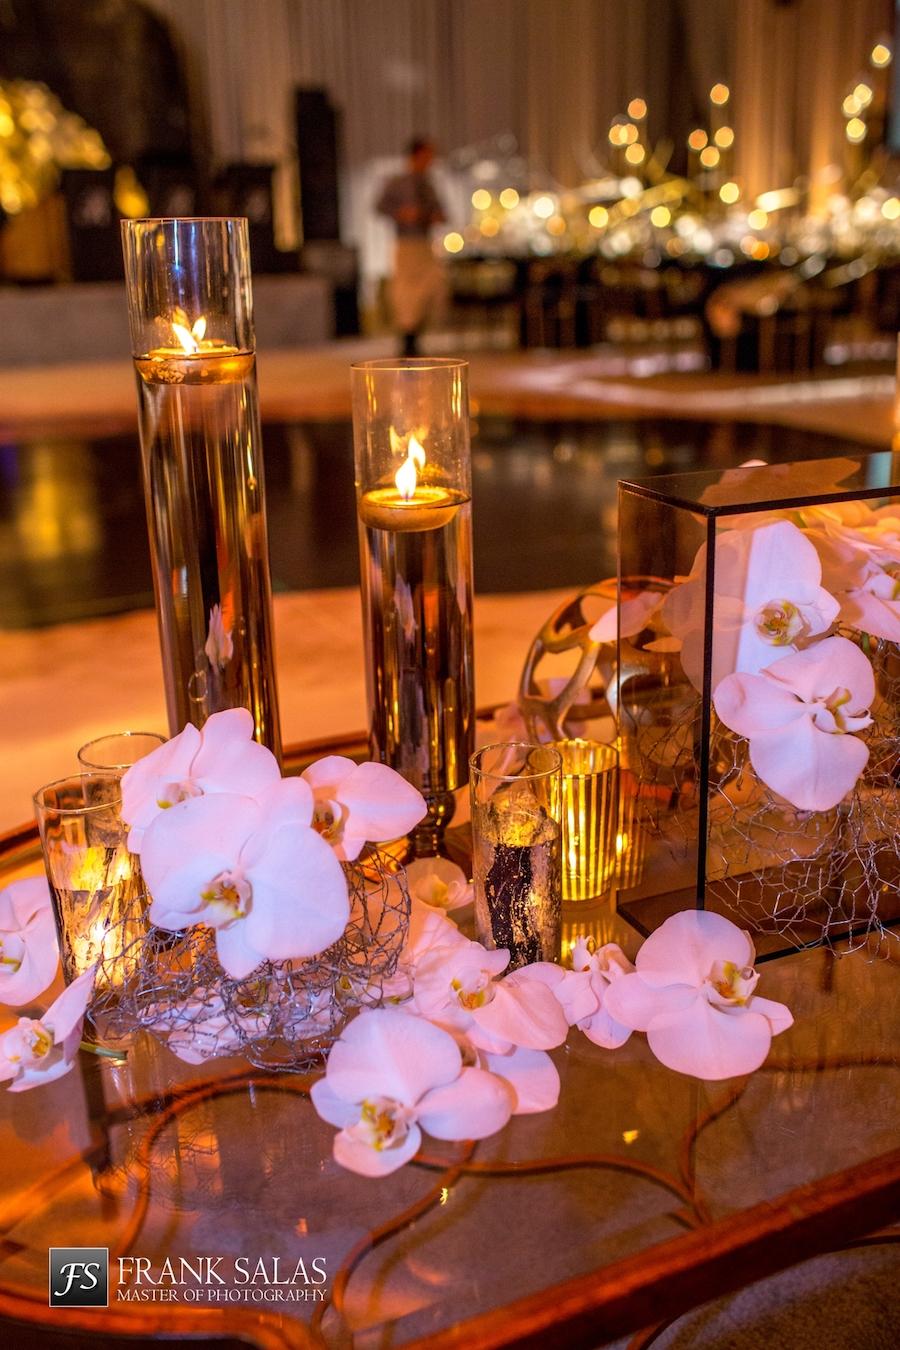 ABC Gala 2017-Shawna-yamamoto-kelsey-events-pasea-hotel-platinum-weddings-by-Kerrie-Frank-Salas-16.jpg